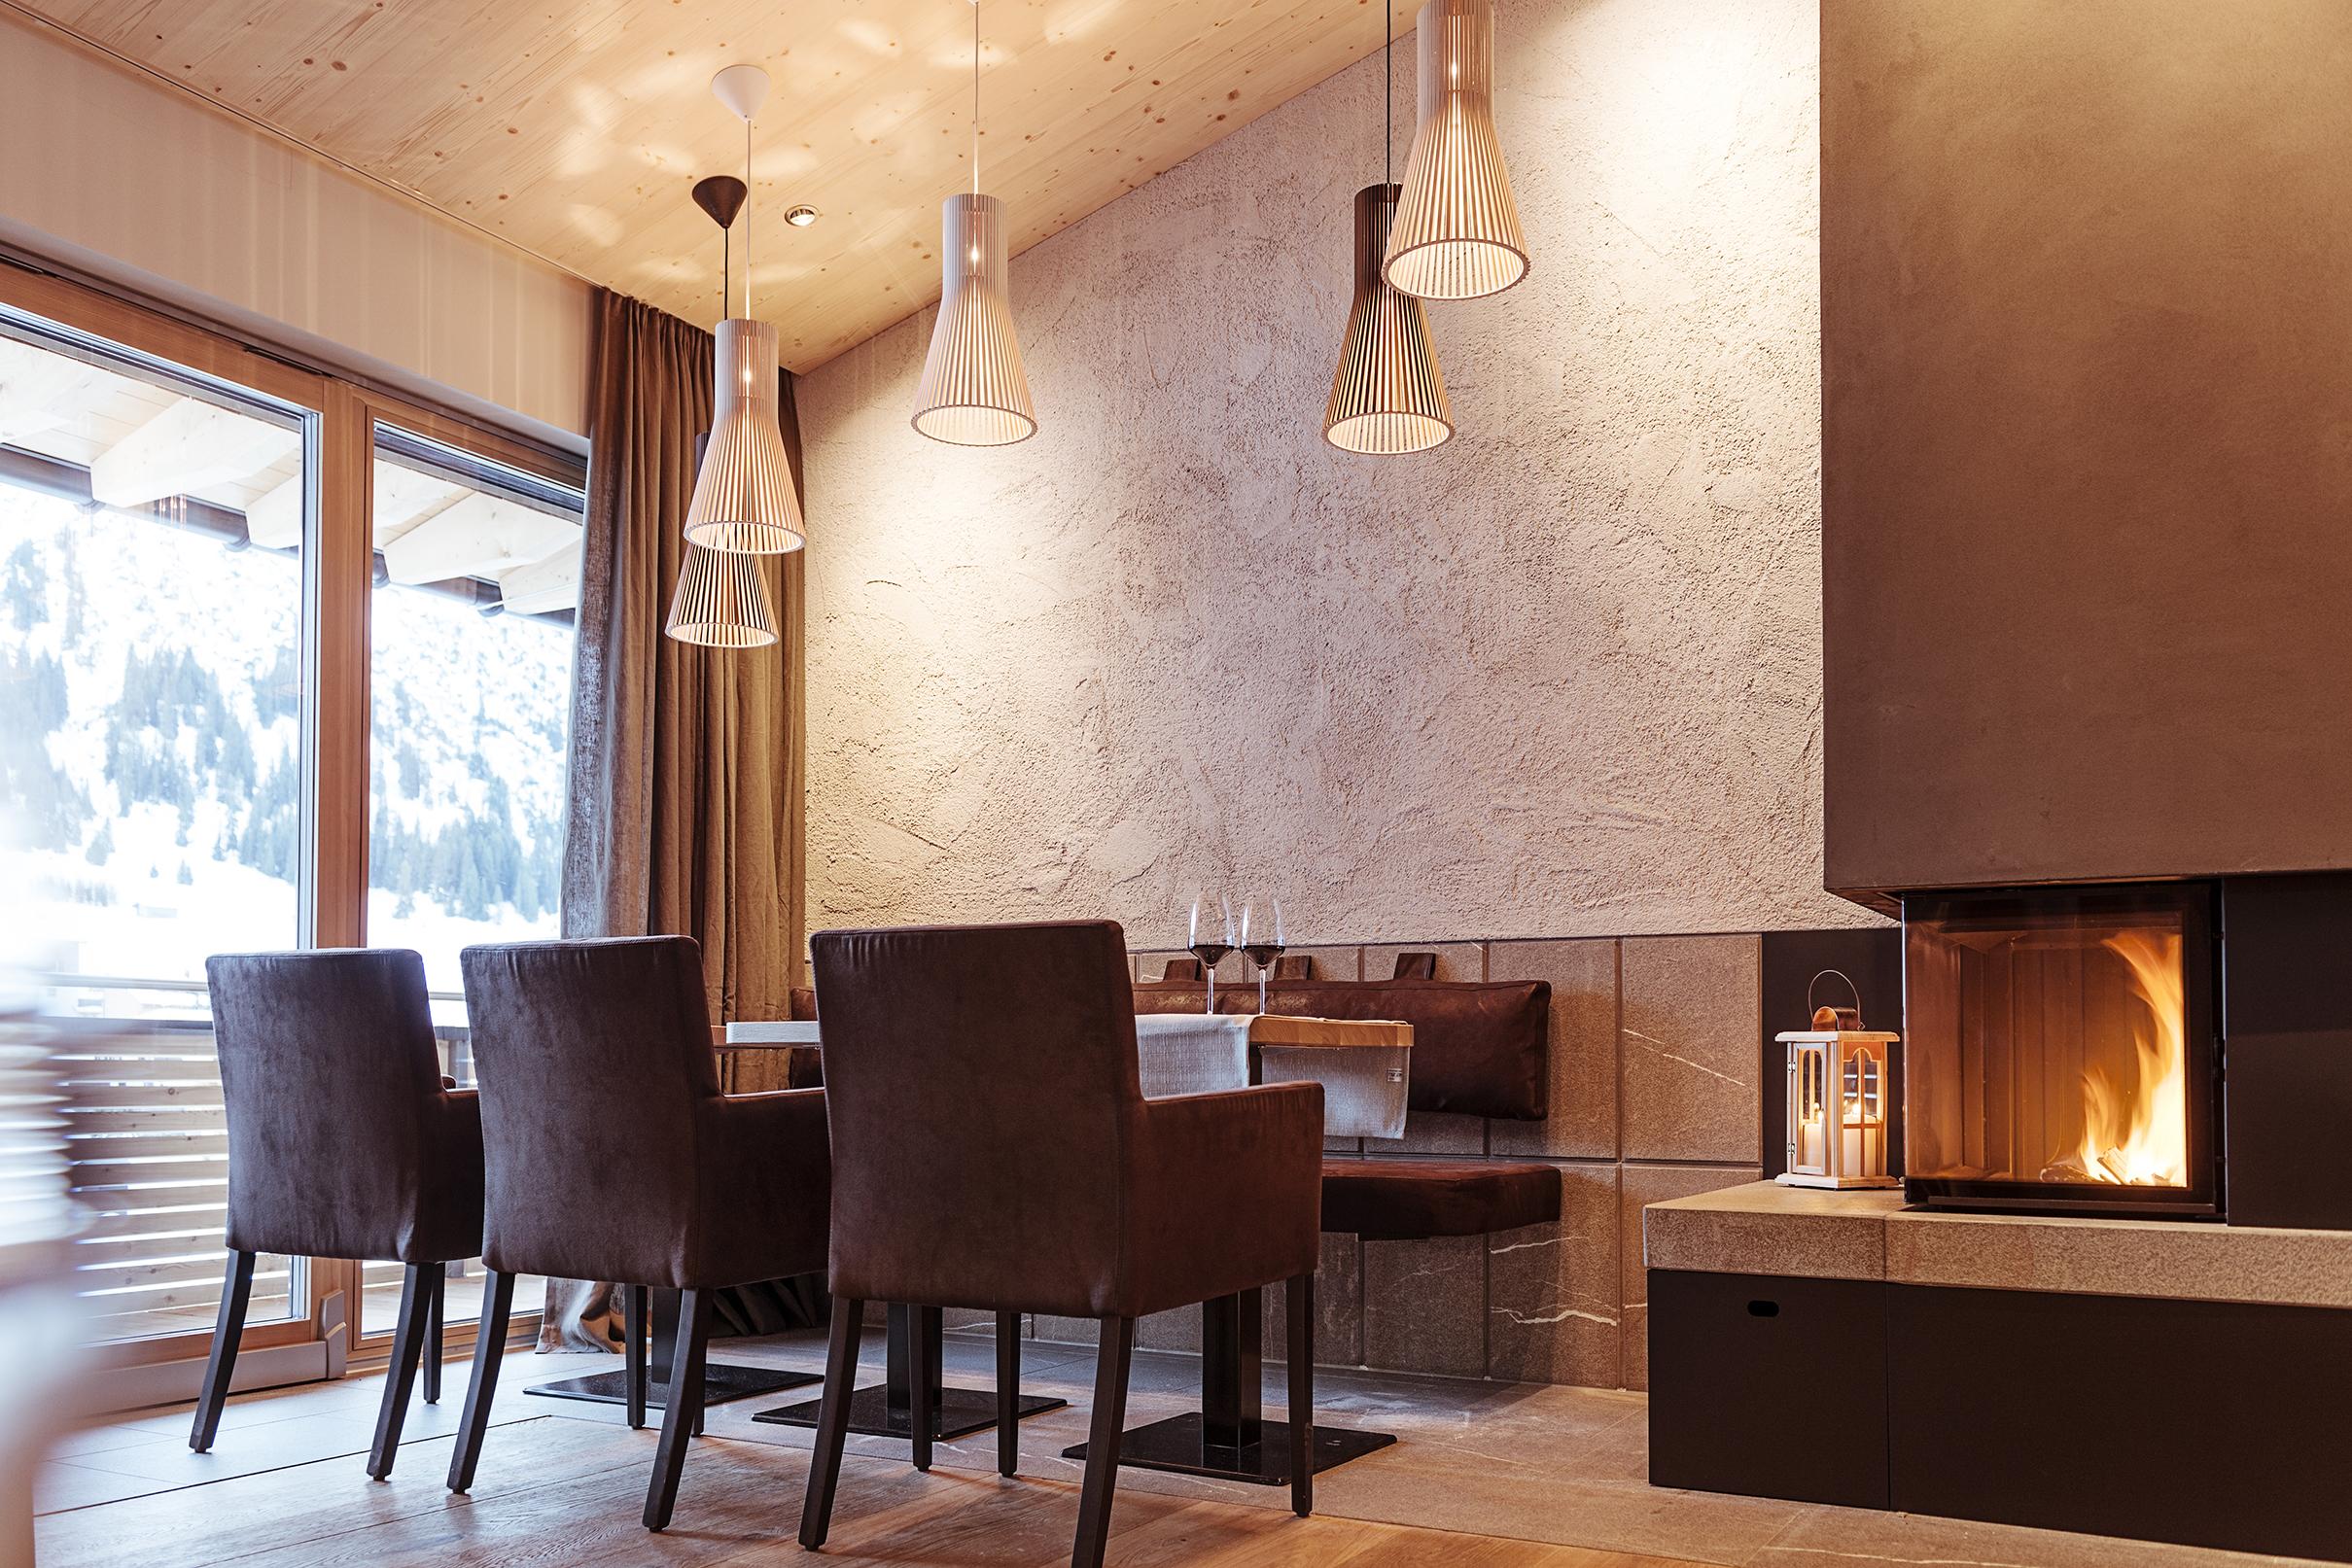 MATS_Lounge_Bar_Kamin_lech